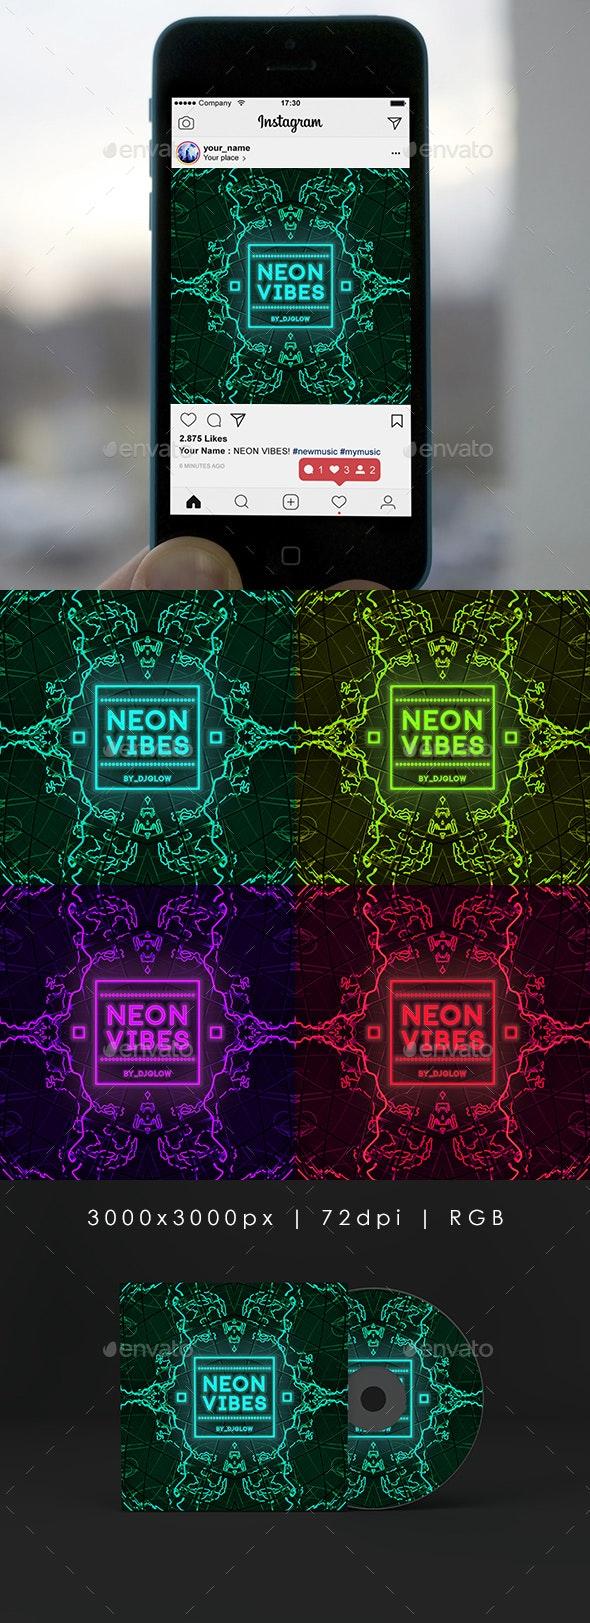 Neon Vibes Music Cover Album Artwork Template - Miscellaneous Social Media